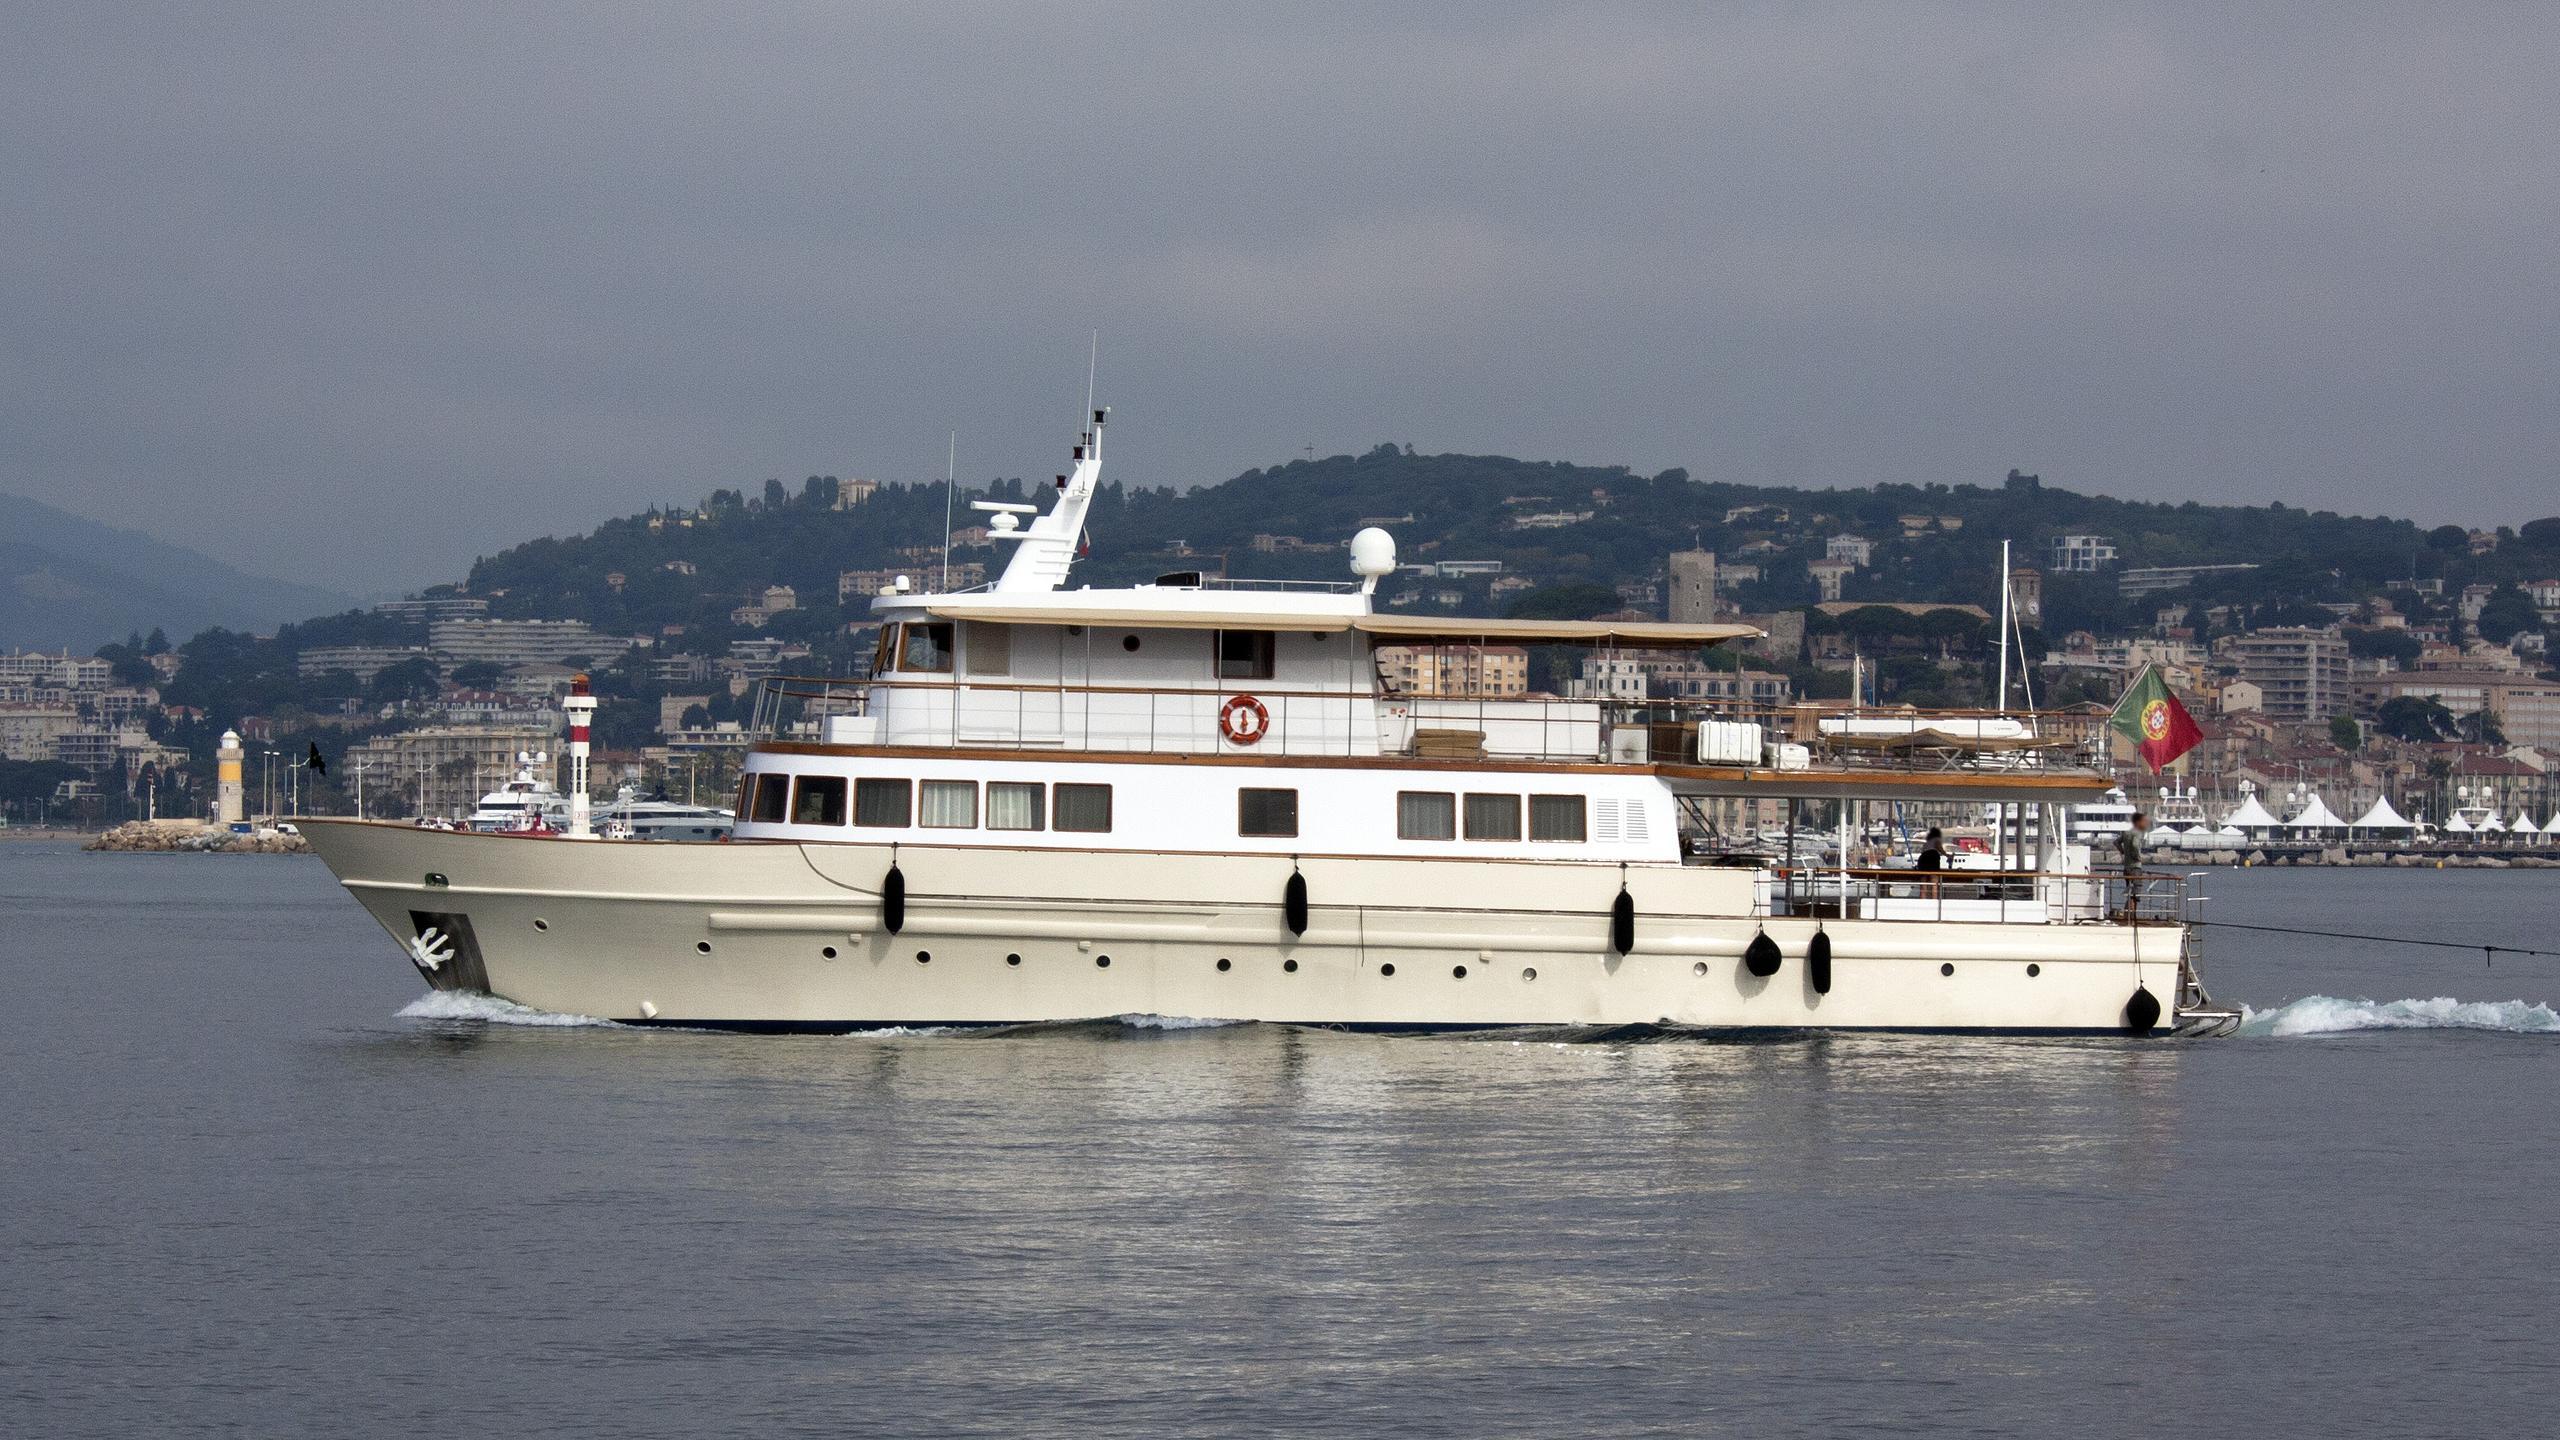 clara-one-motor-yacht-sarri-1961-31m-profile